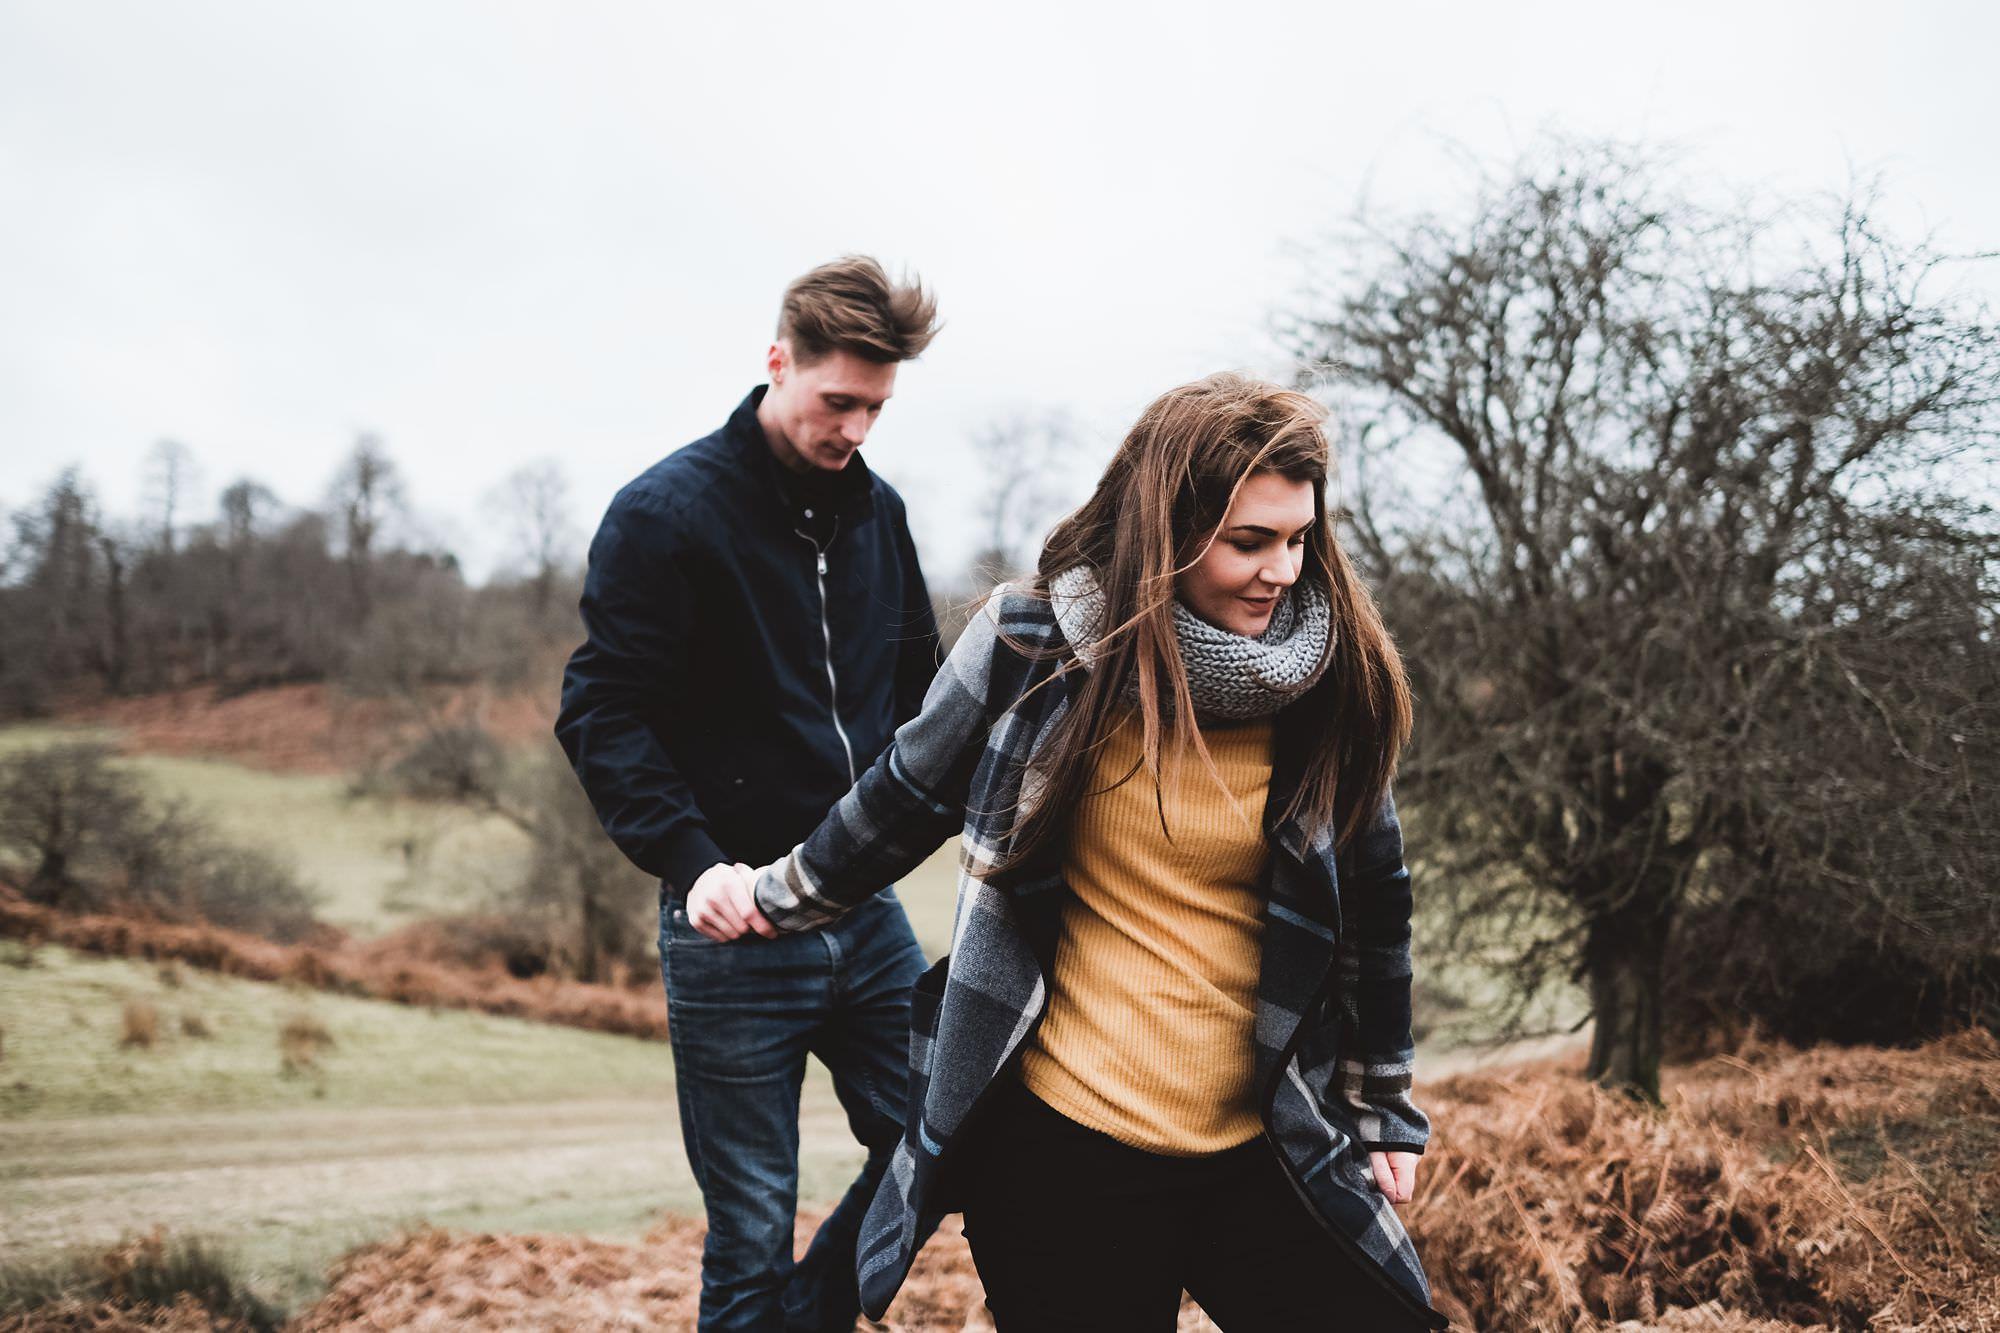 Engagement shoot at Knole Park